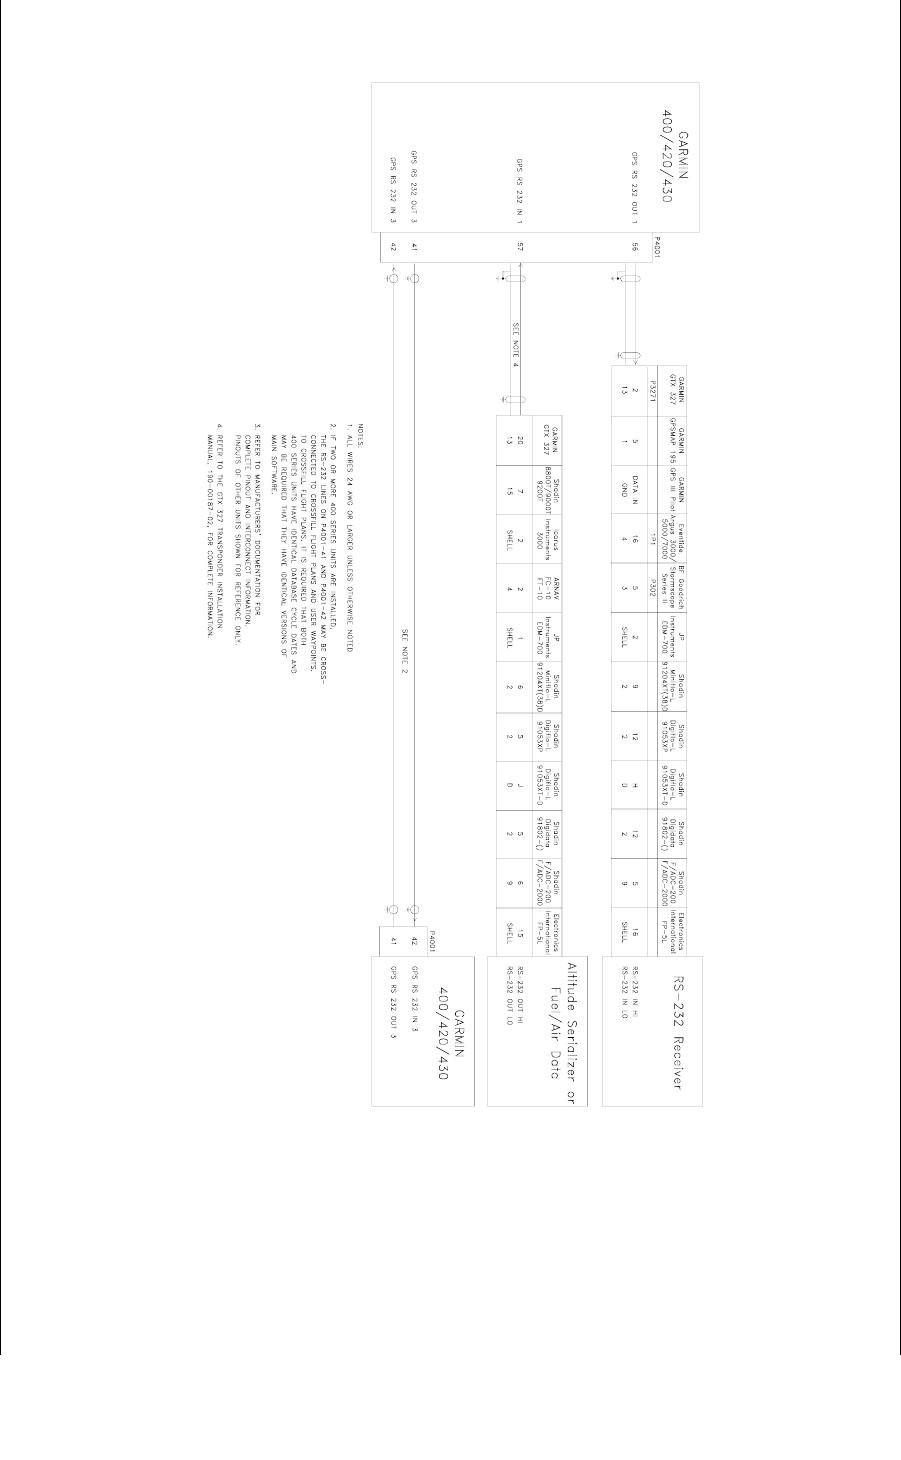 garmin fuel wiring diagram schematic diagrams rh ogmconsulting co 3-Pin XLR Wiring-Diagram Garmin 3010C Wiring-Diagram 17